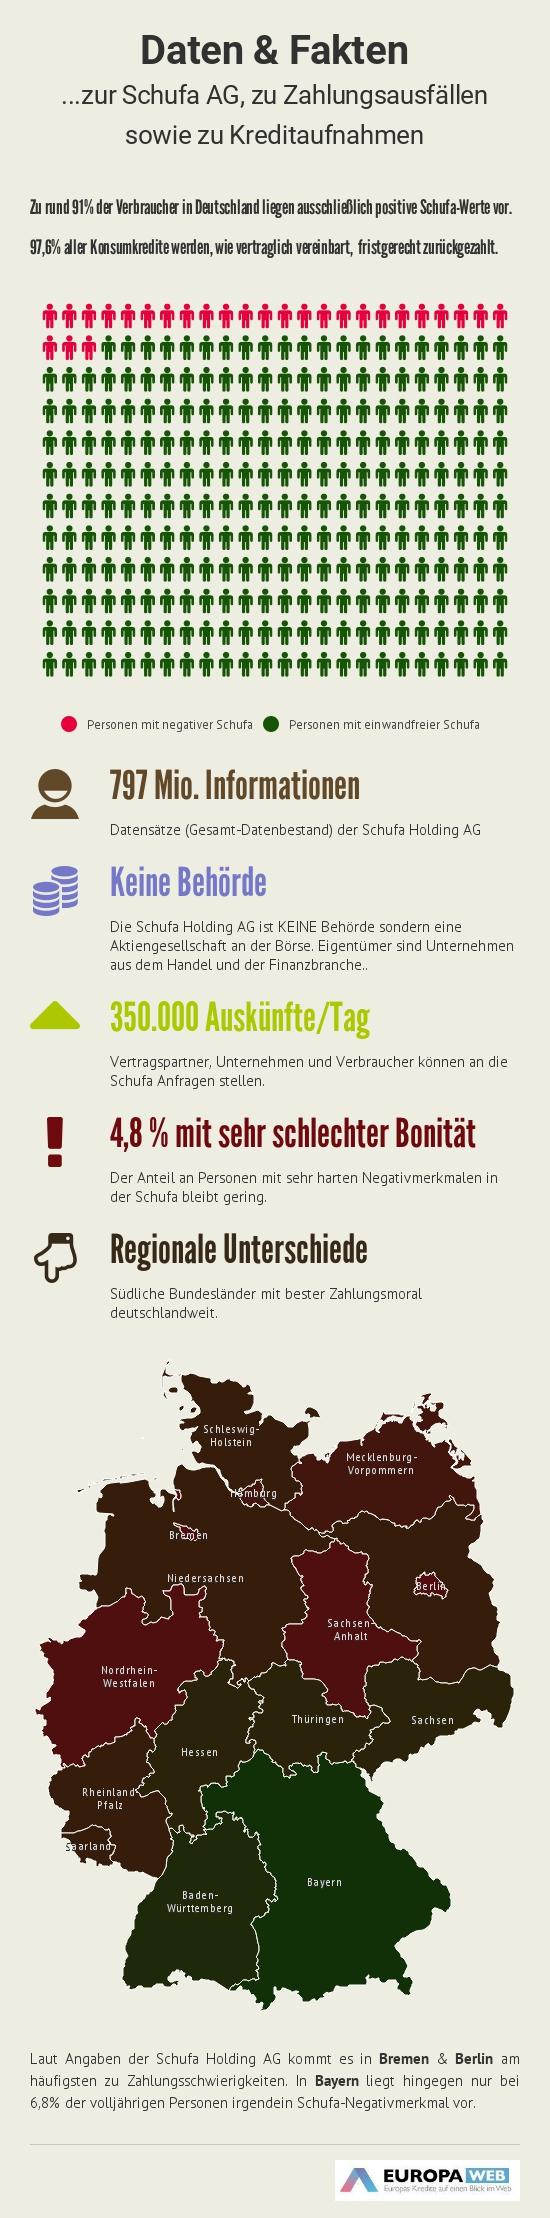 Negative Schufa und Kredite Infografik